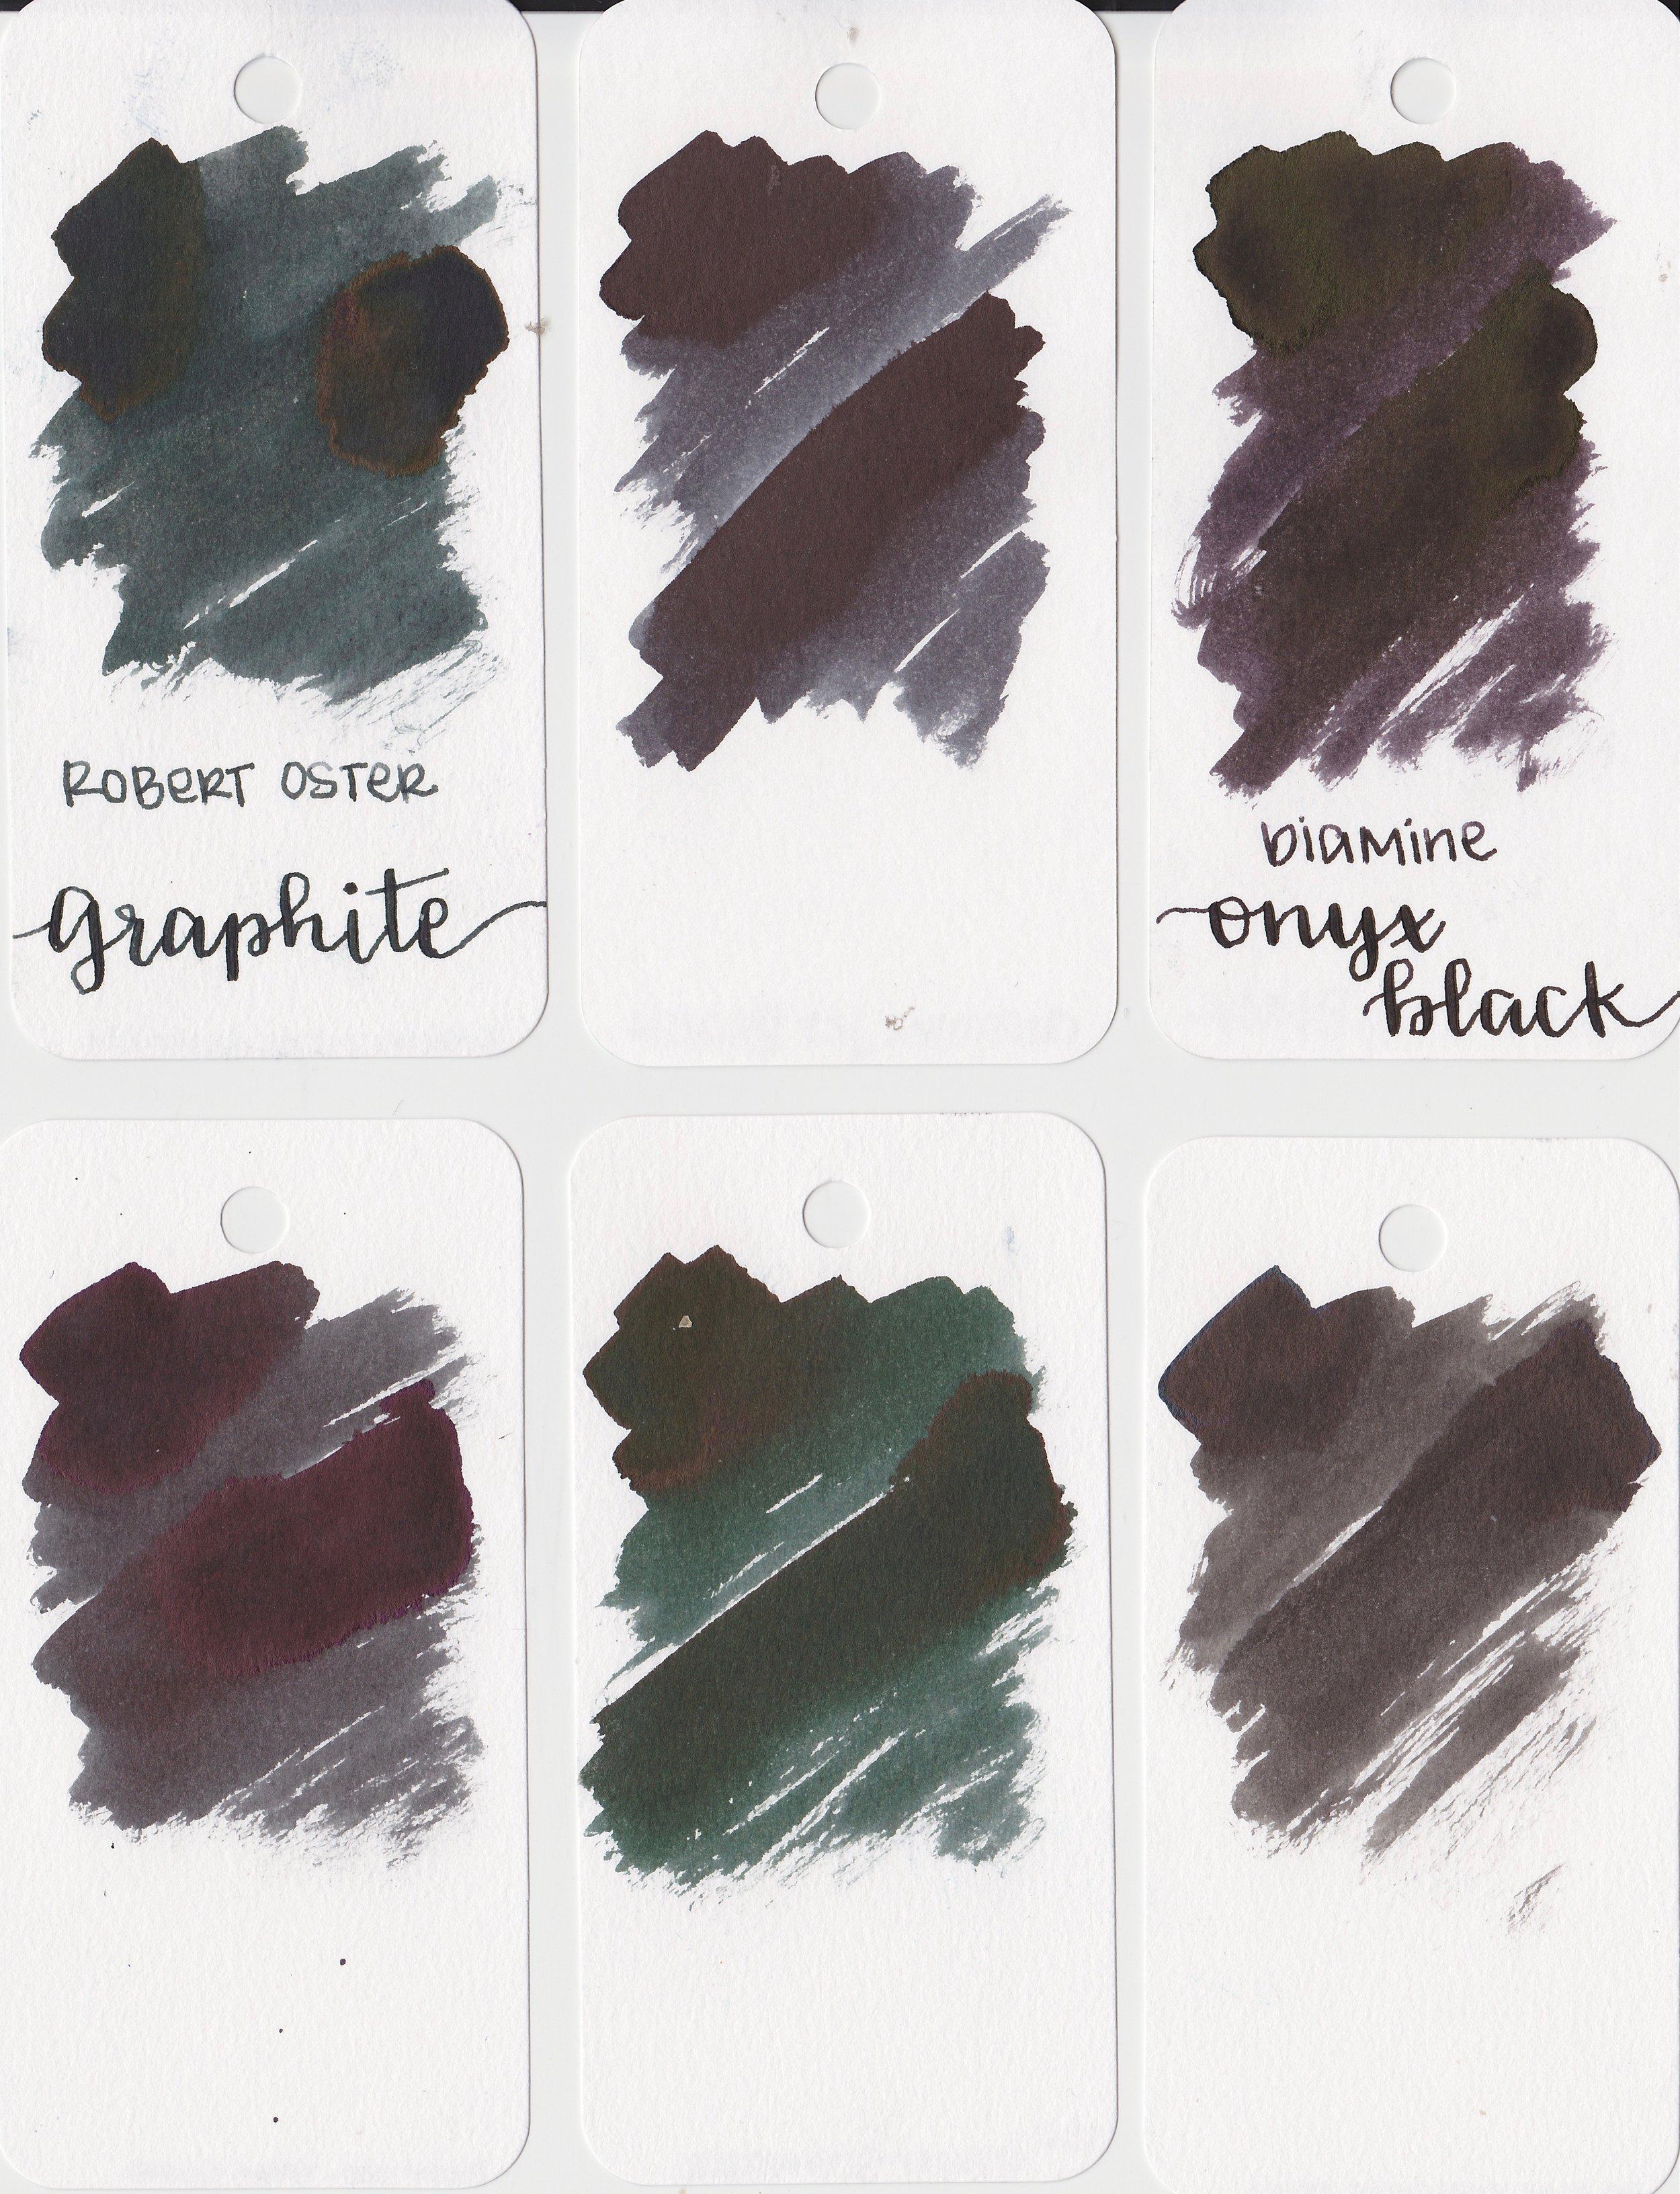 Similar inks: - Top row: left to right, Robert Oster Graphite, Diamine Jet Black, and Diamine Onyx Black. Bottom row: Pilot Iroshizuku Take-sumi, Robert Oster Grun-Schwarz, and Pelikan Edelstein Onyx.